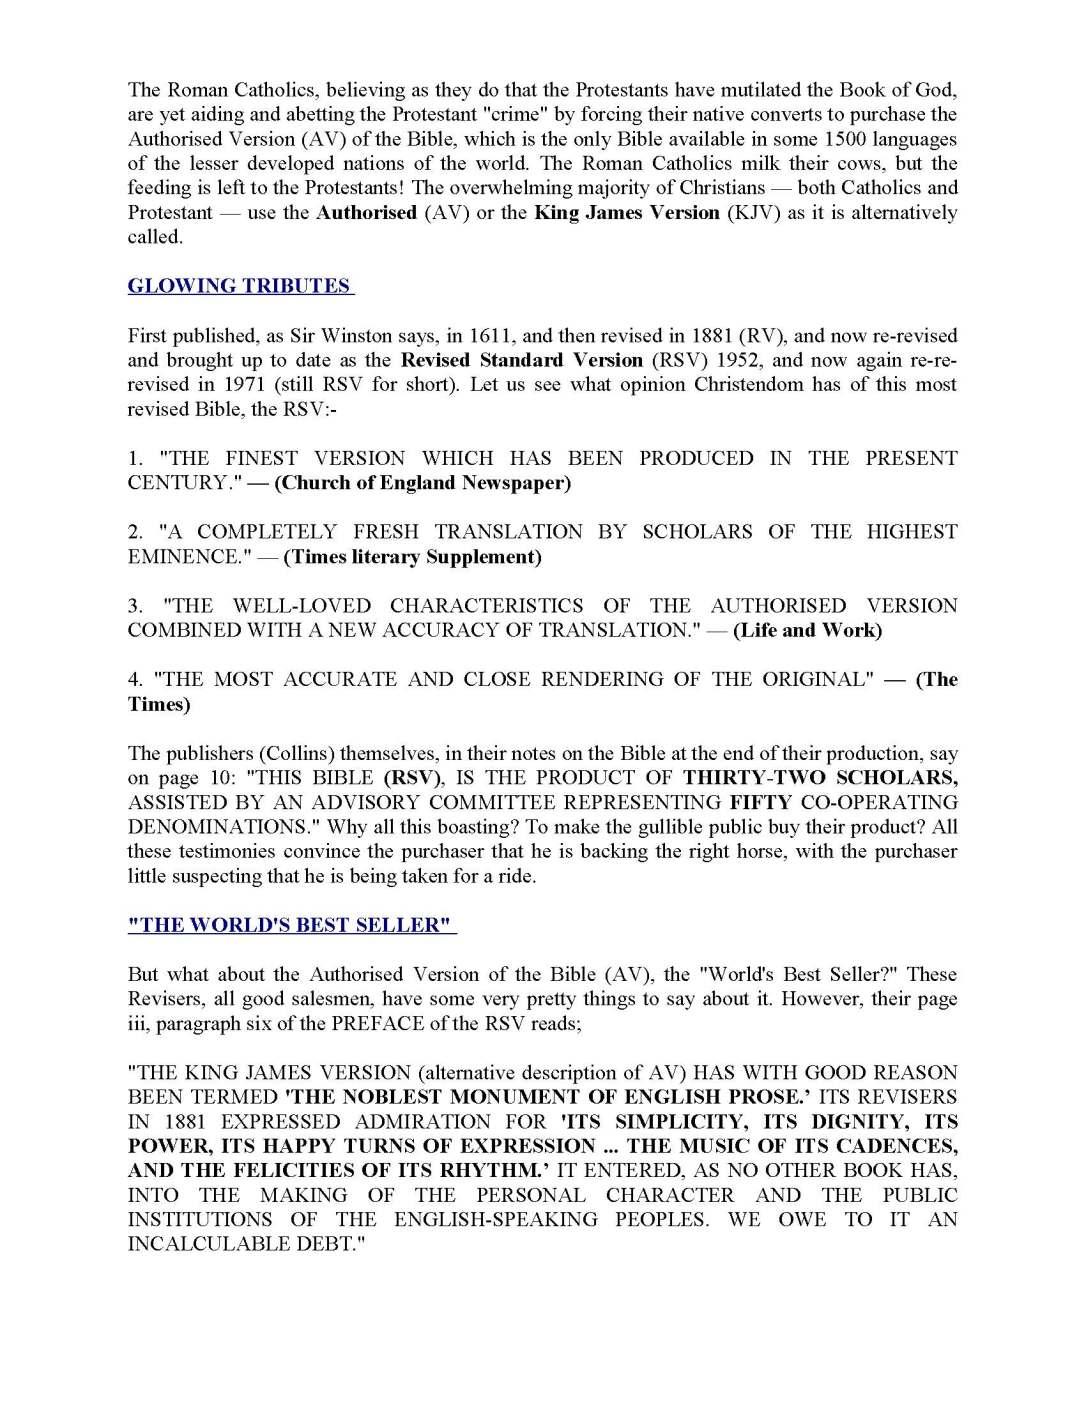 Is The Bible Gods Word [deedat]_Page_07